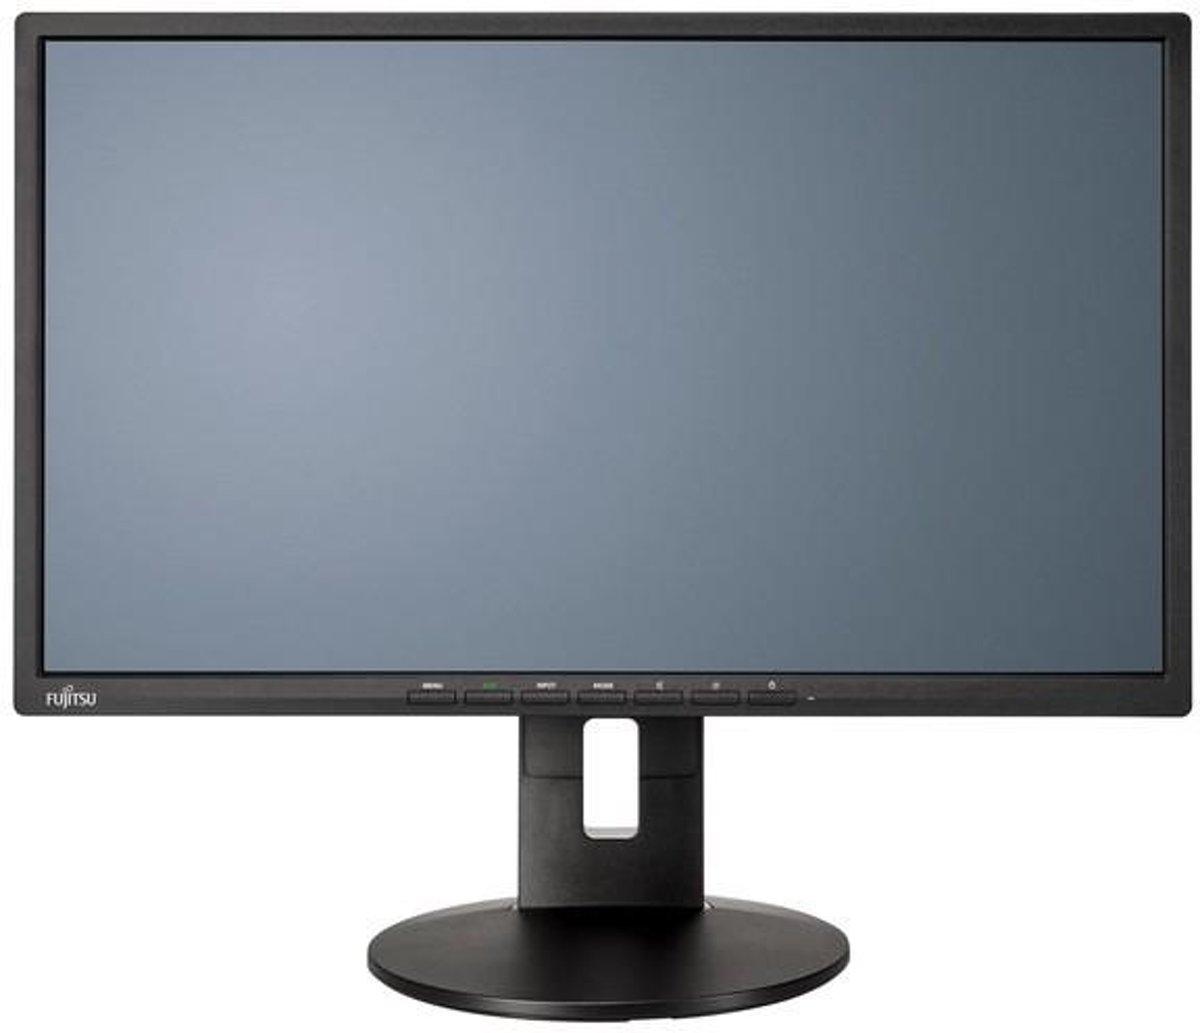 Fujitsu Displays B22-8 TS Pro computer monitor 54,6 cm (21.5'') Full HD LED Flat Zwart